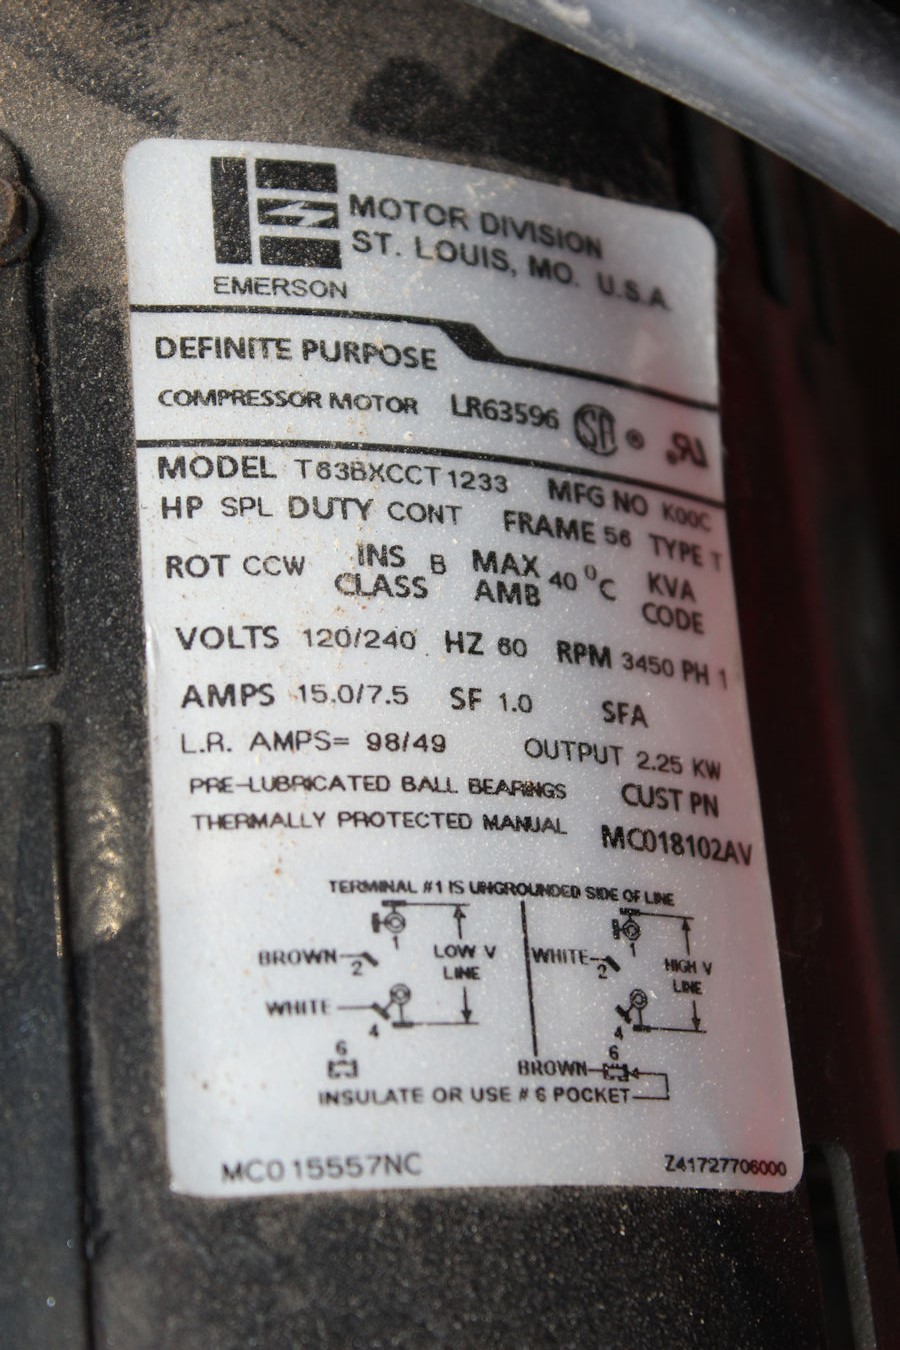 Husky 26 Gallon Air Compressor Manual